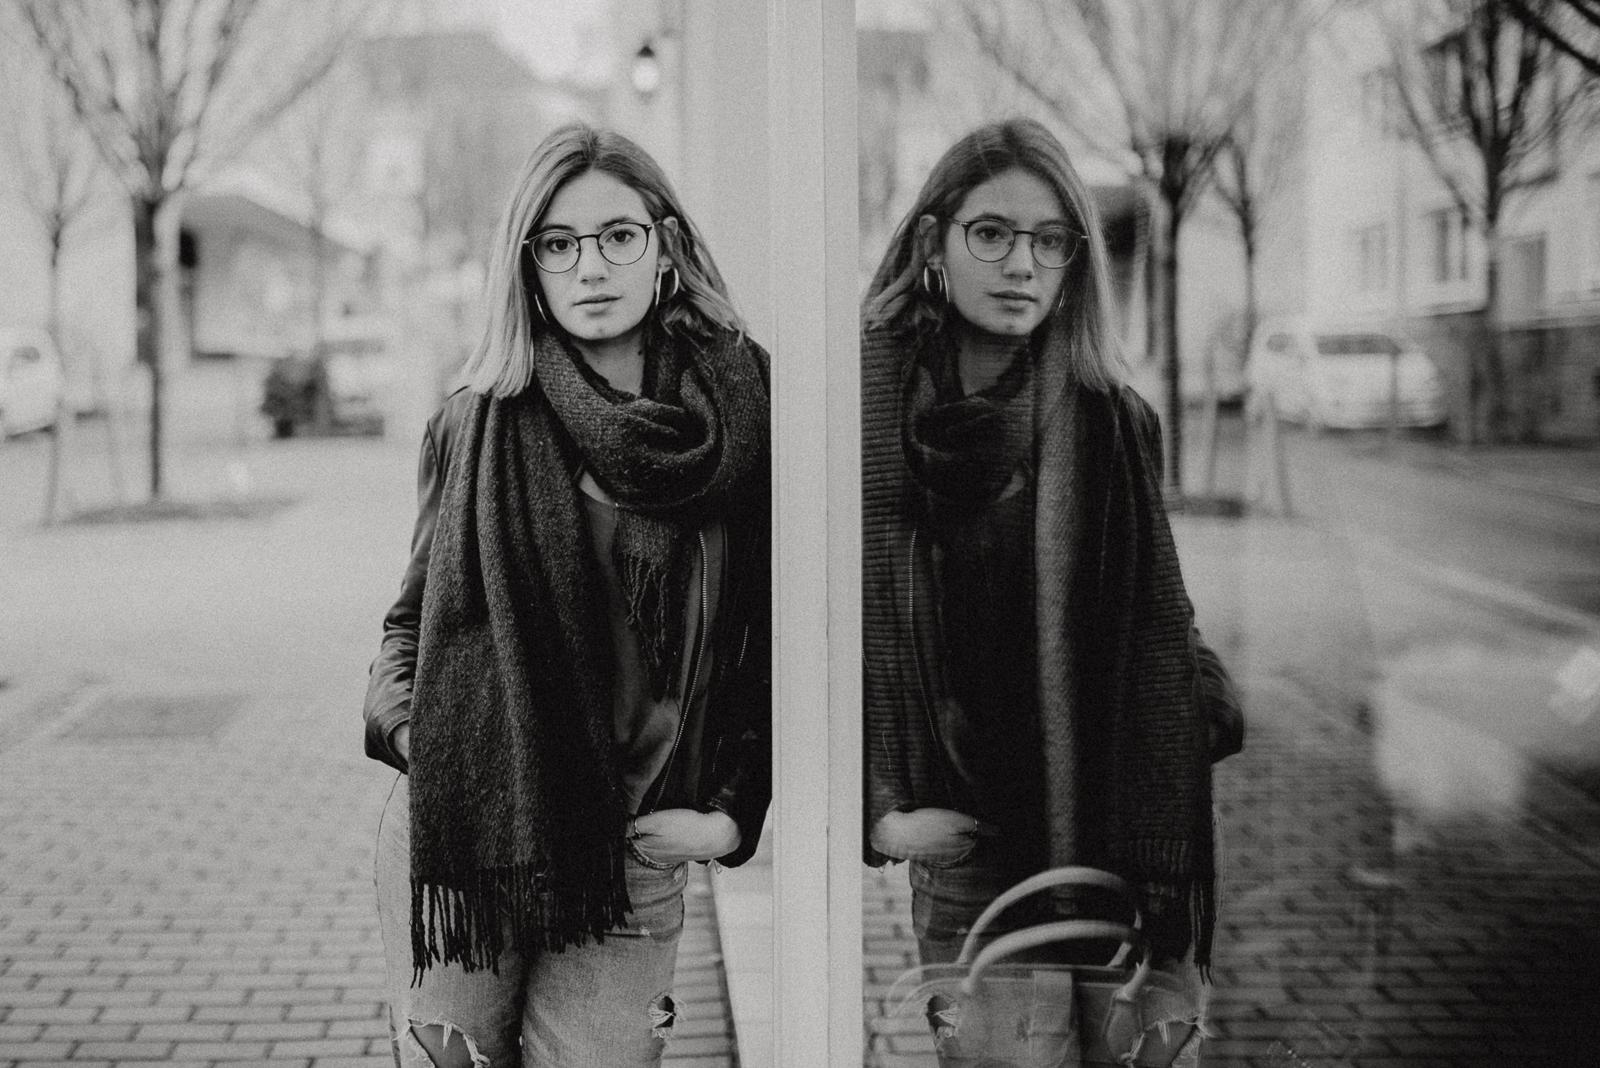 031-designparaplus-fotografin-witten-portrait-shooting-downtown